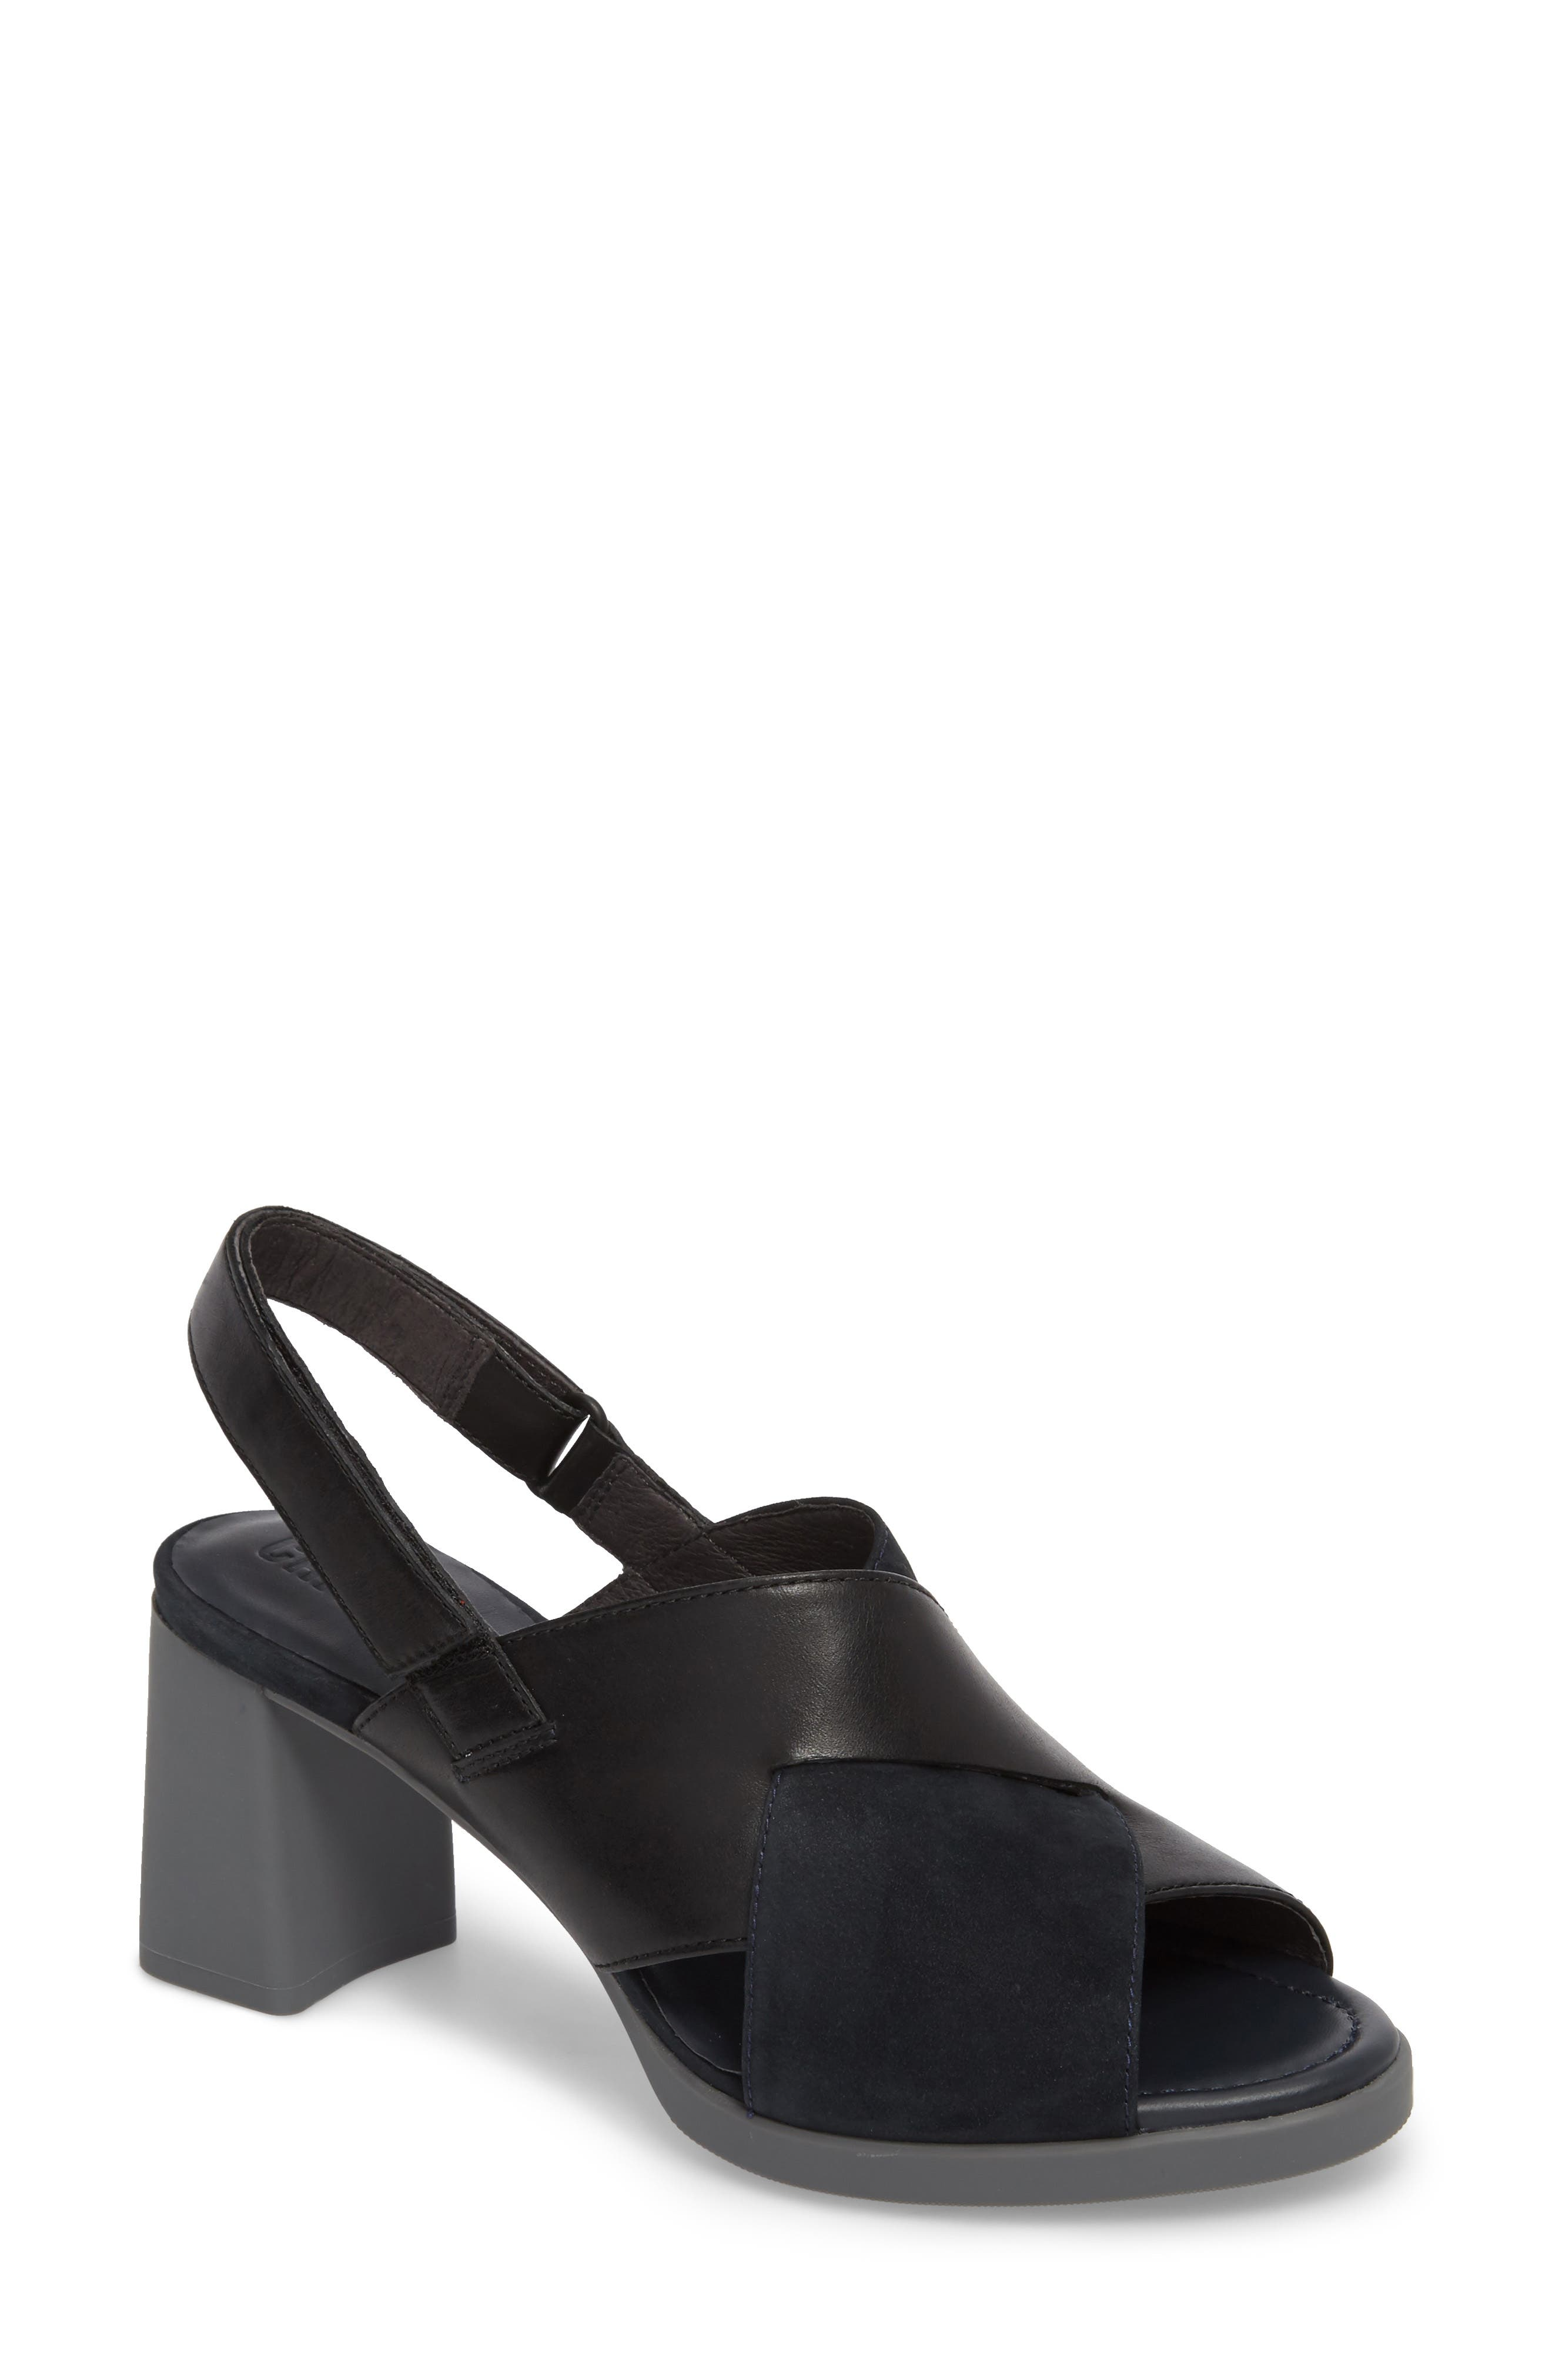 Main Image - Camper Kara Cross Strap Sandal (Women)